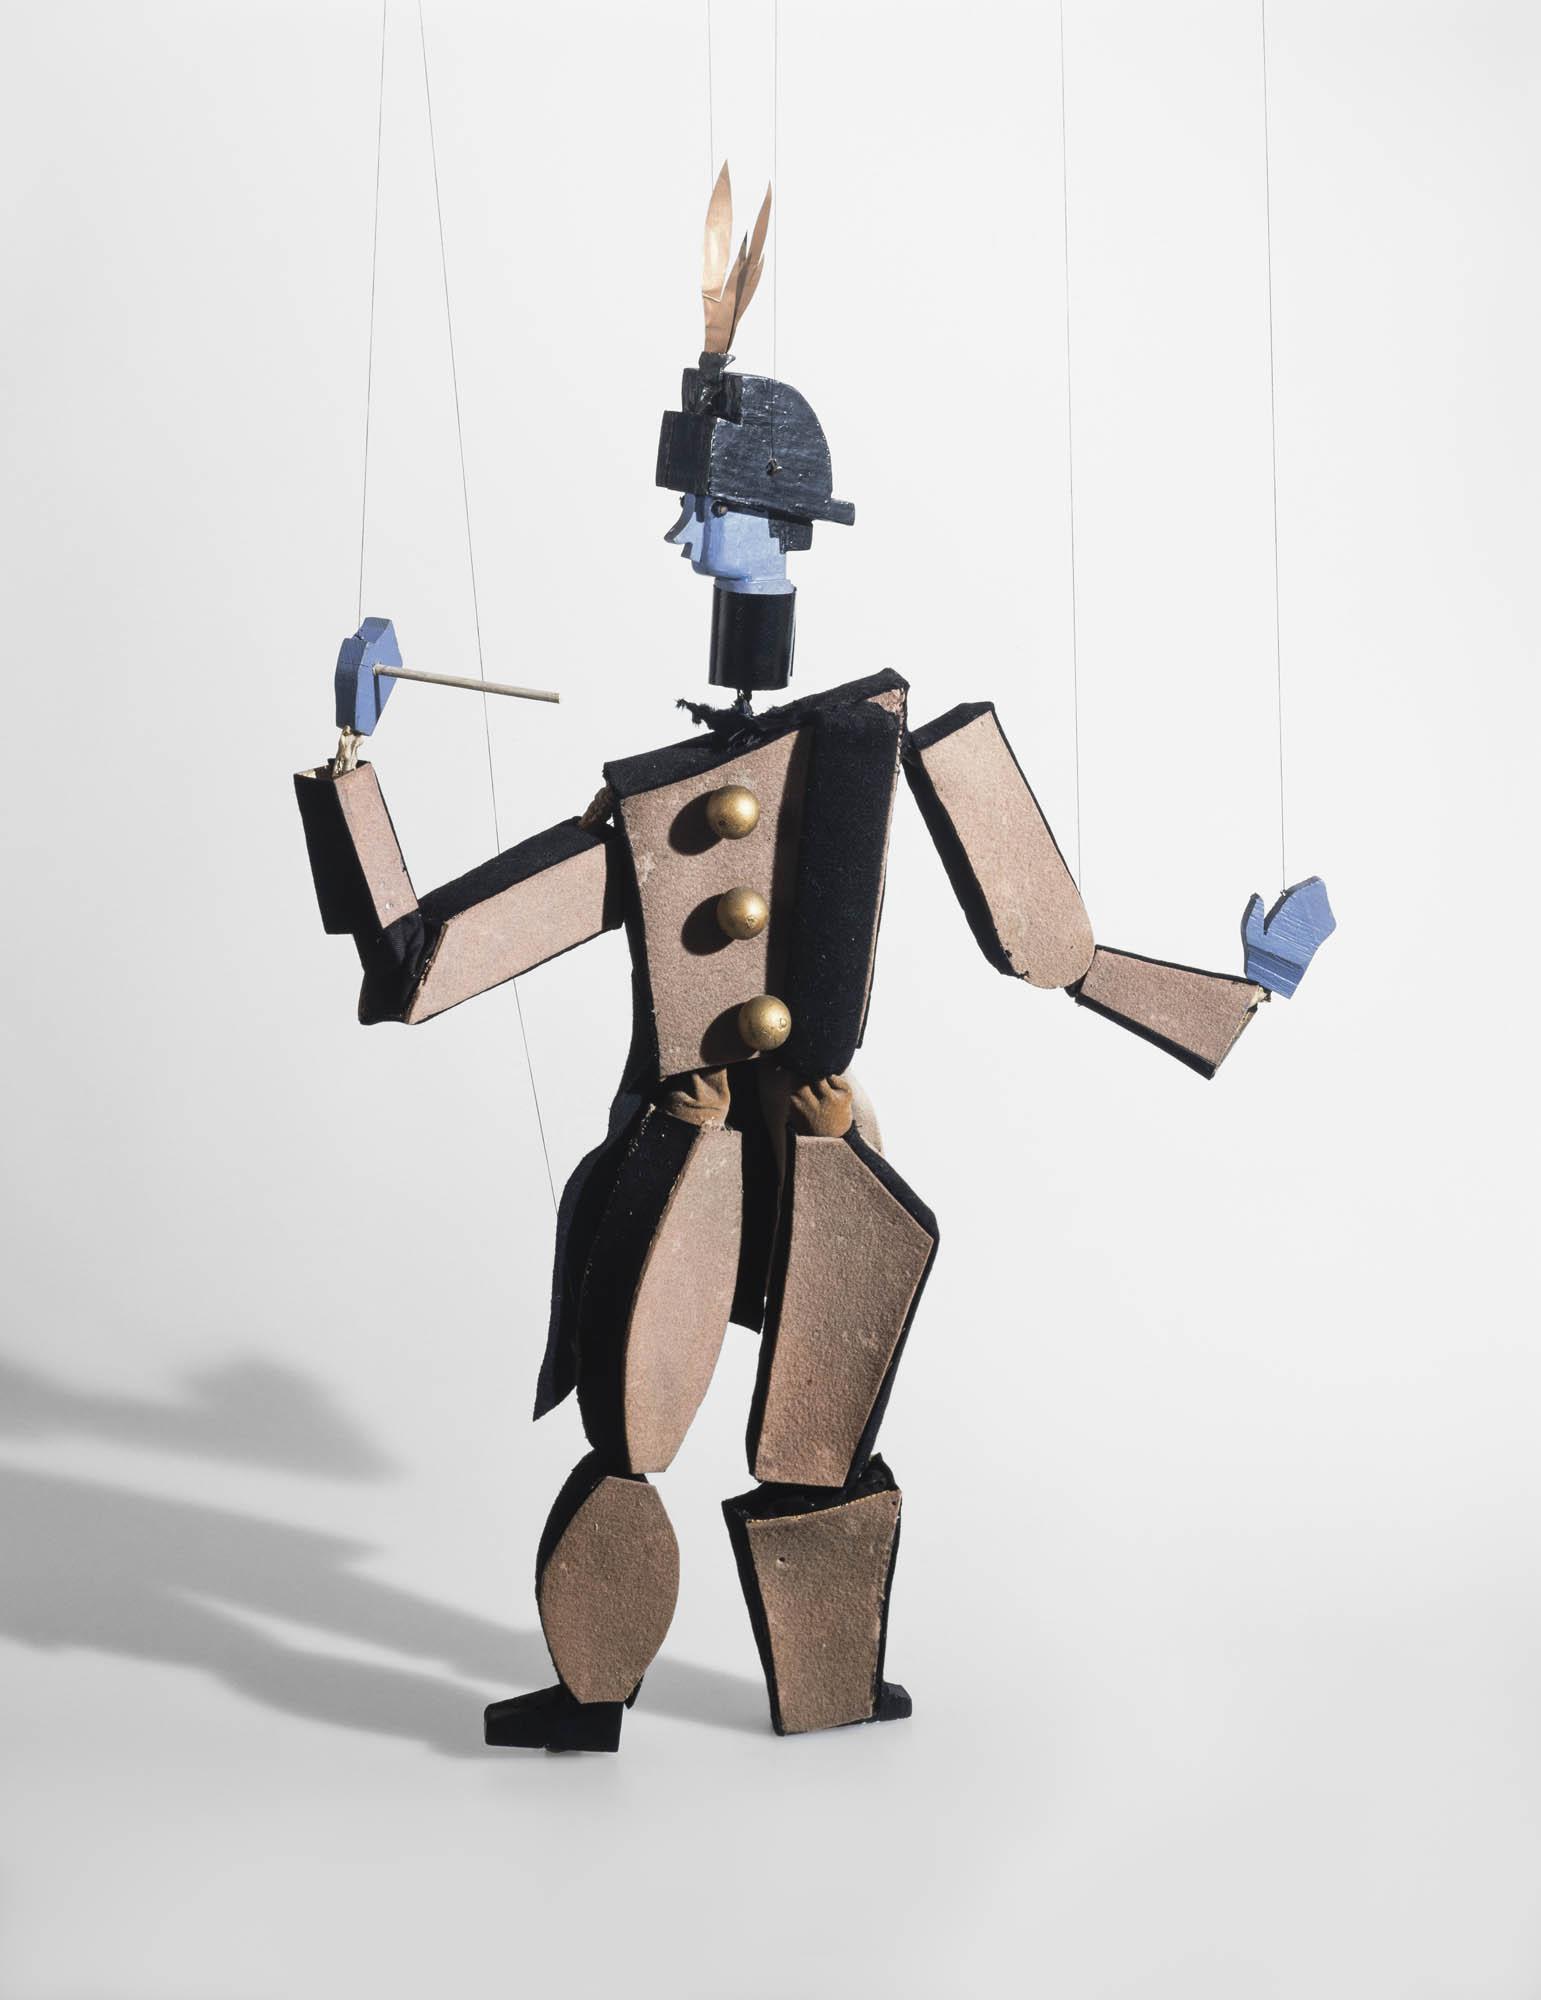 Longhi I Alexandra Exter Marionette